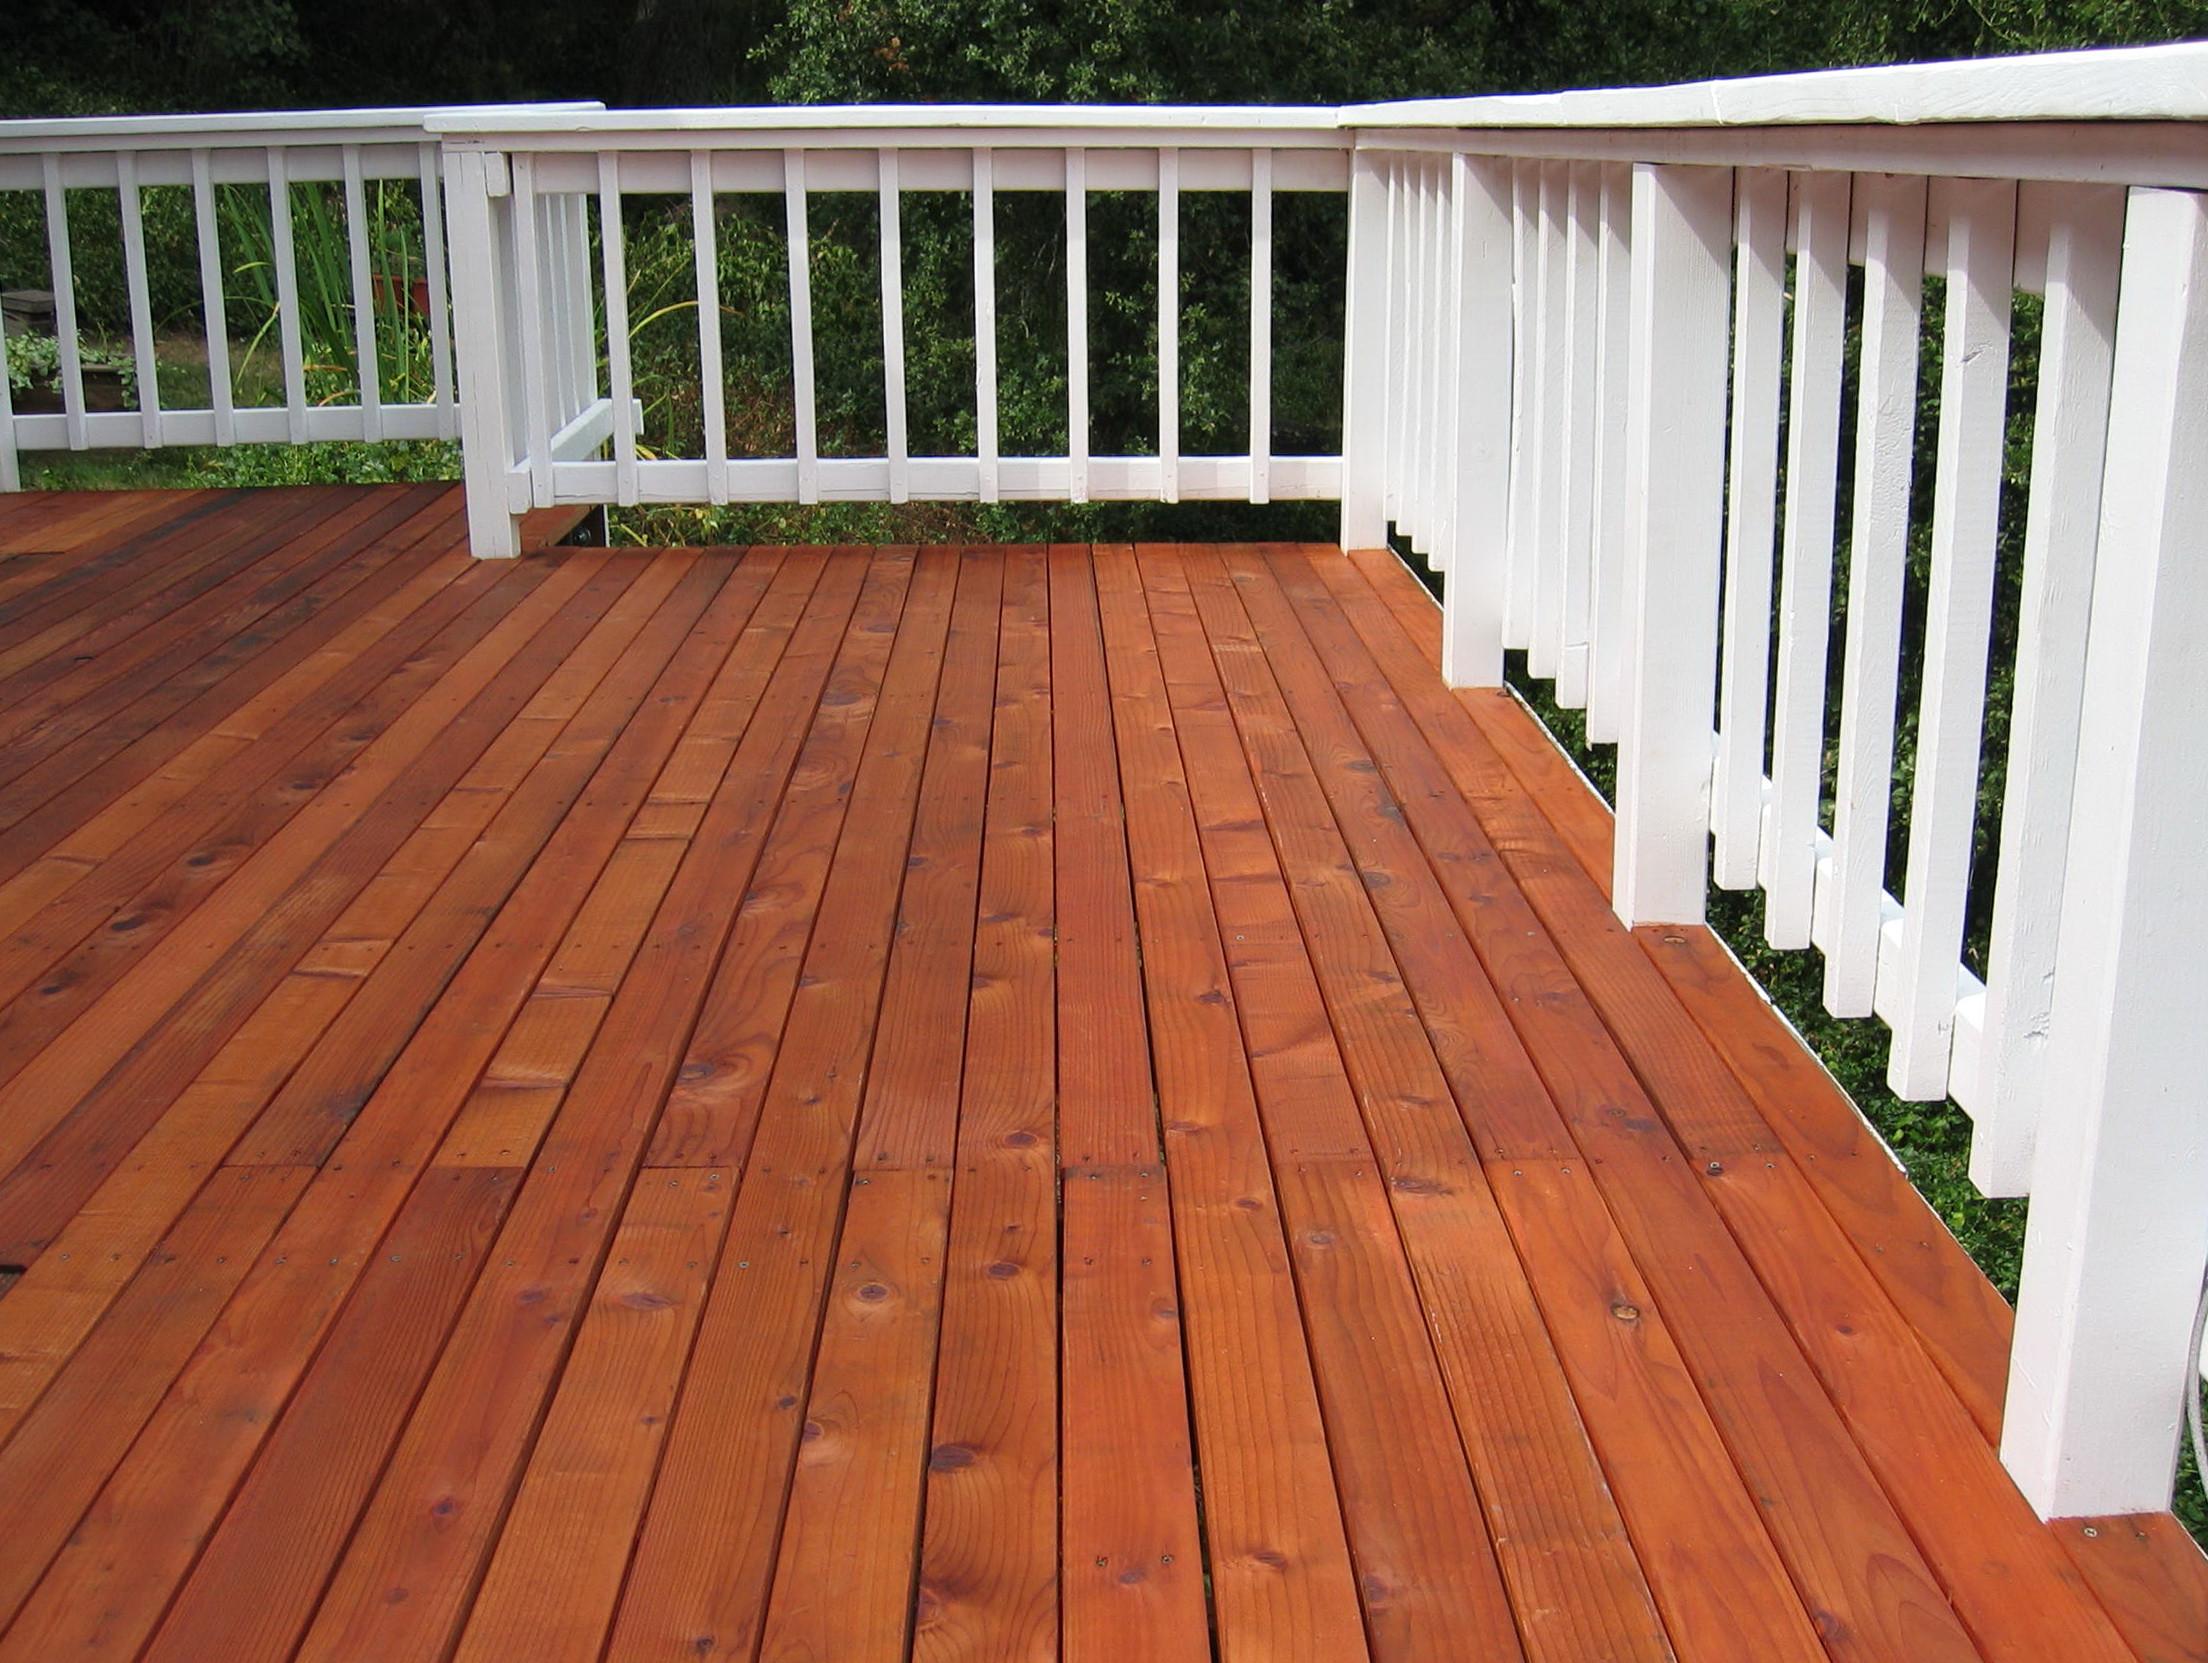 Deck Over Paint Lowes Elegant Deck Over Paint Lowes